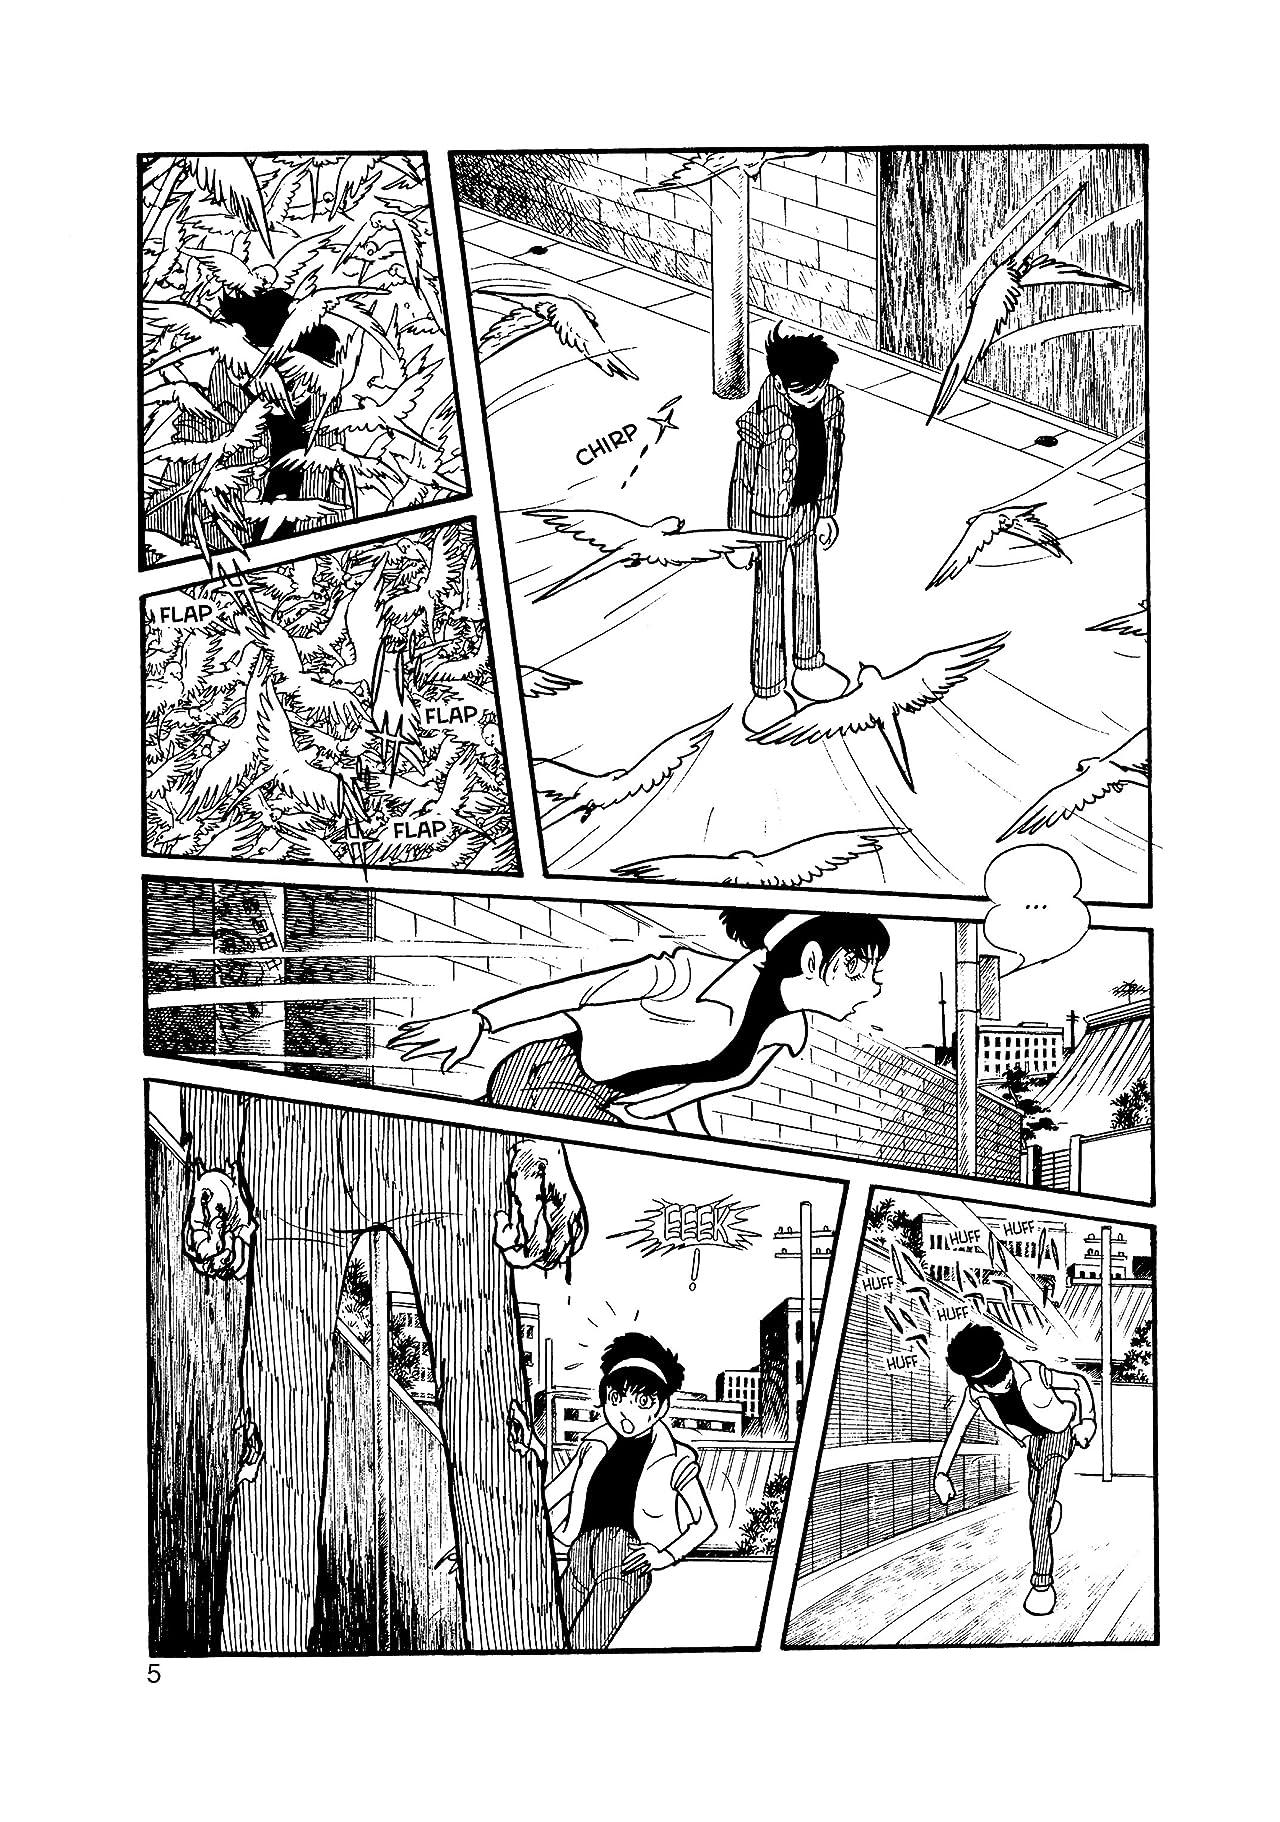 Inazuman Vol. 4: Preview